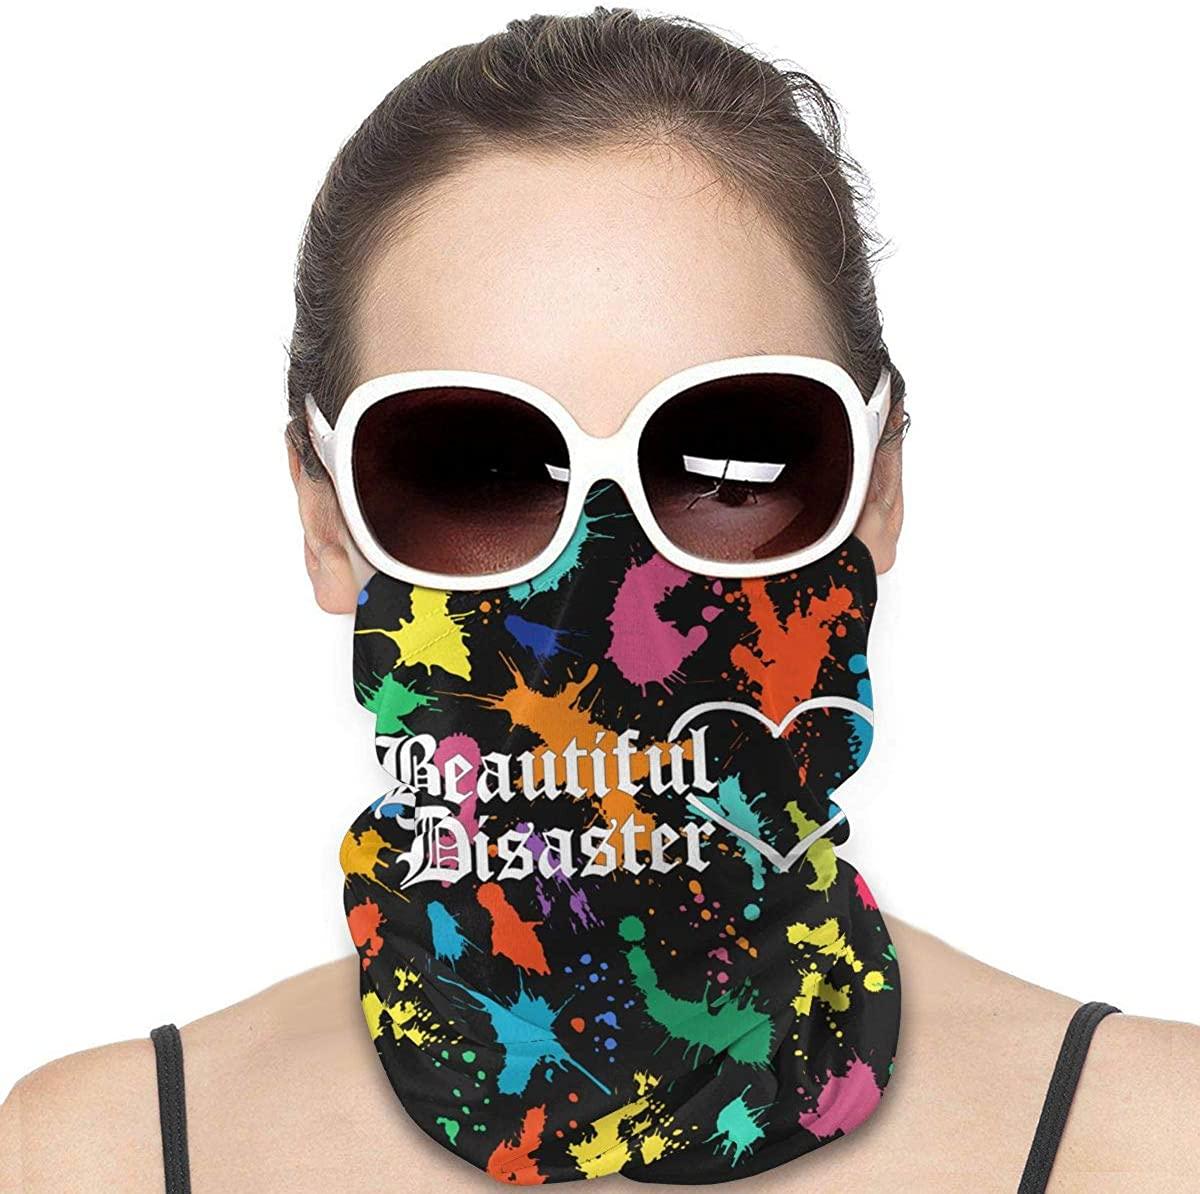 Beautiful Disaster Headwear, Bandana, Neck Gaiter Head Wrap Headband Balaclava Magic Scarf